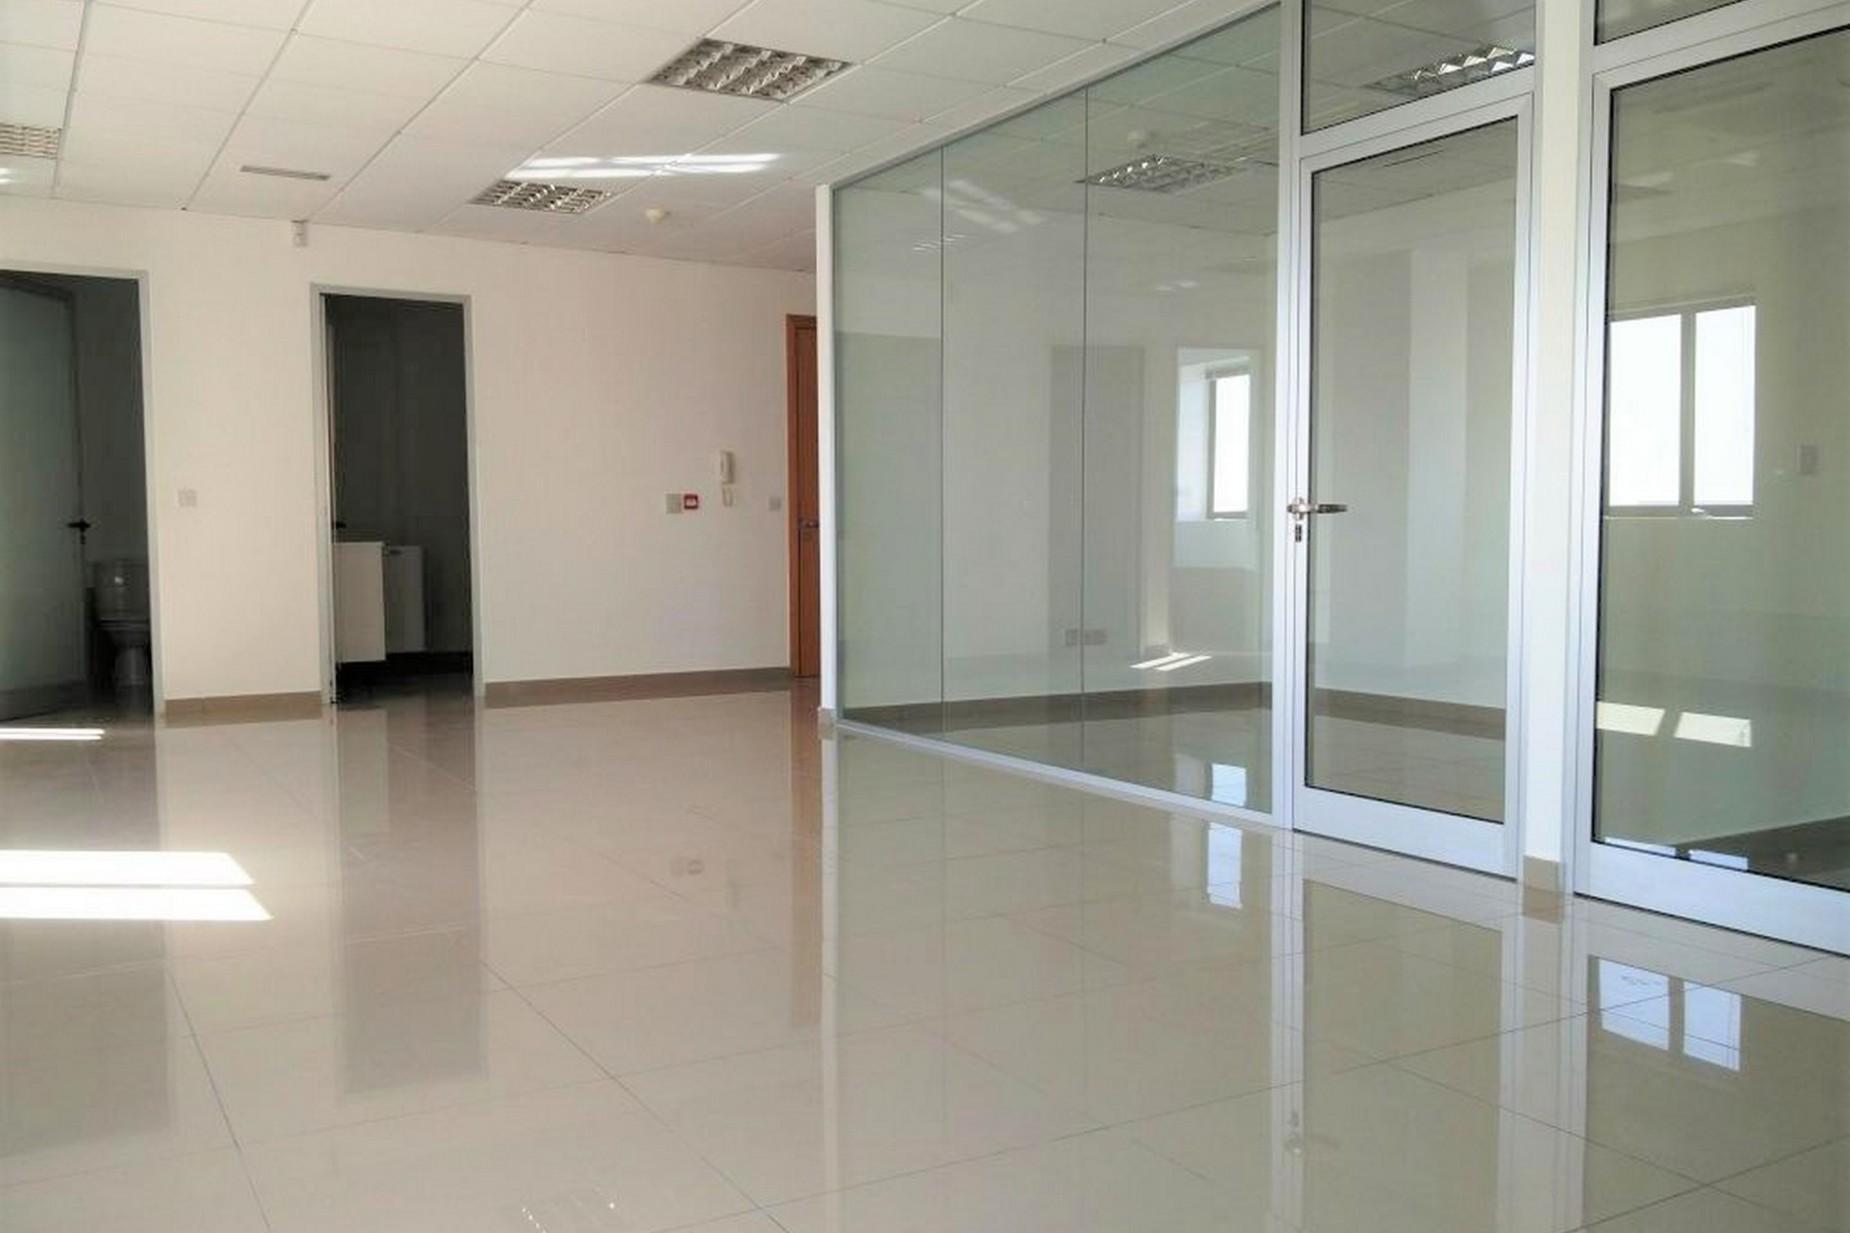 0 bed Office For Rent in Birkirkara, Birkirkara - thumb 6